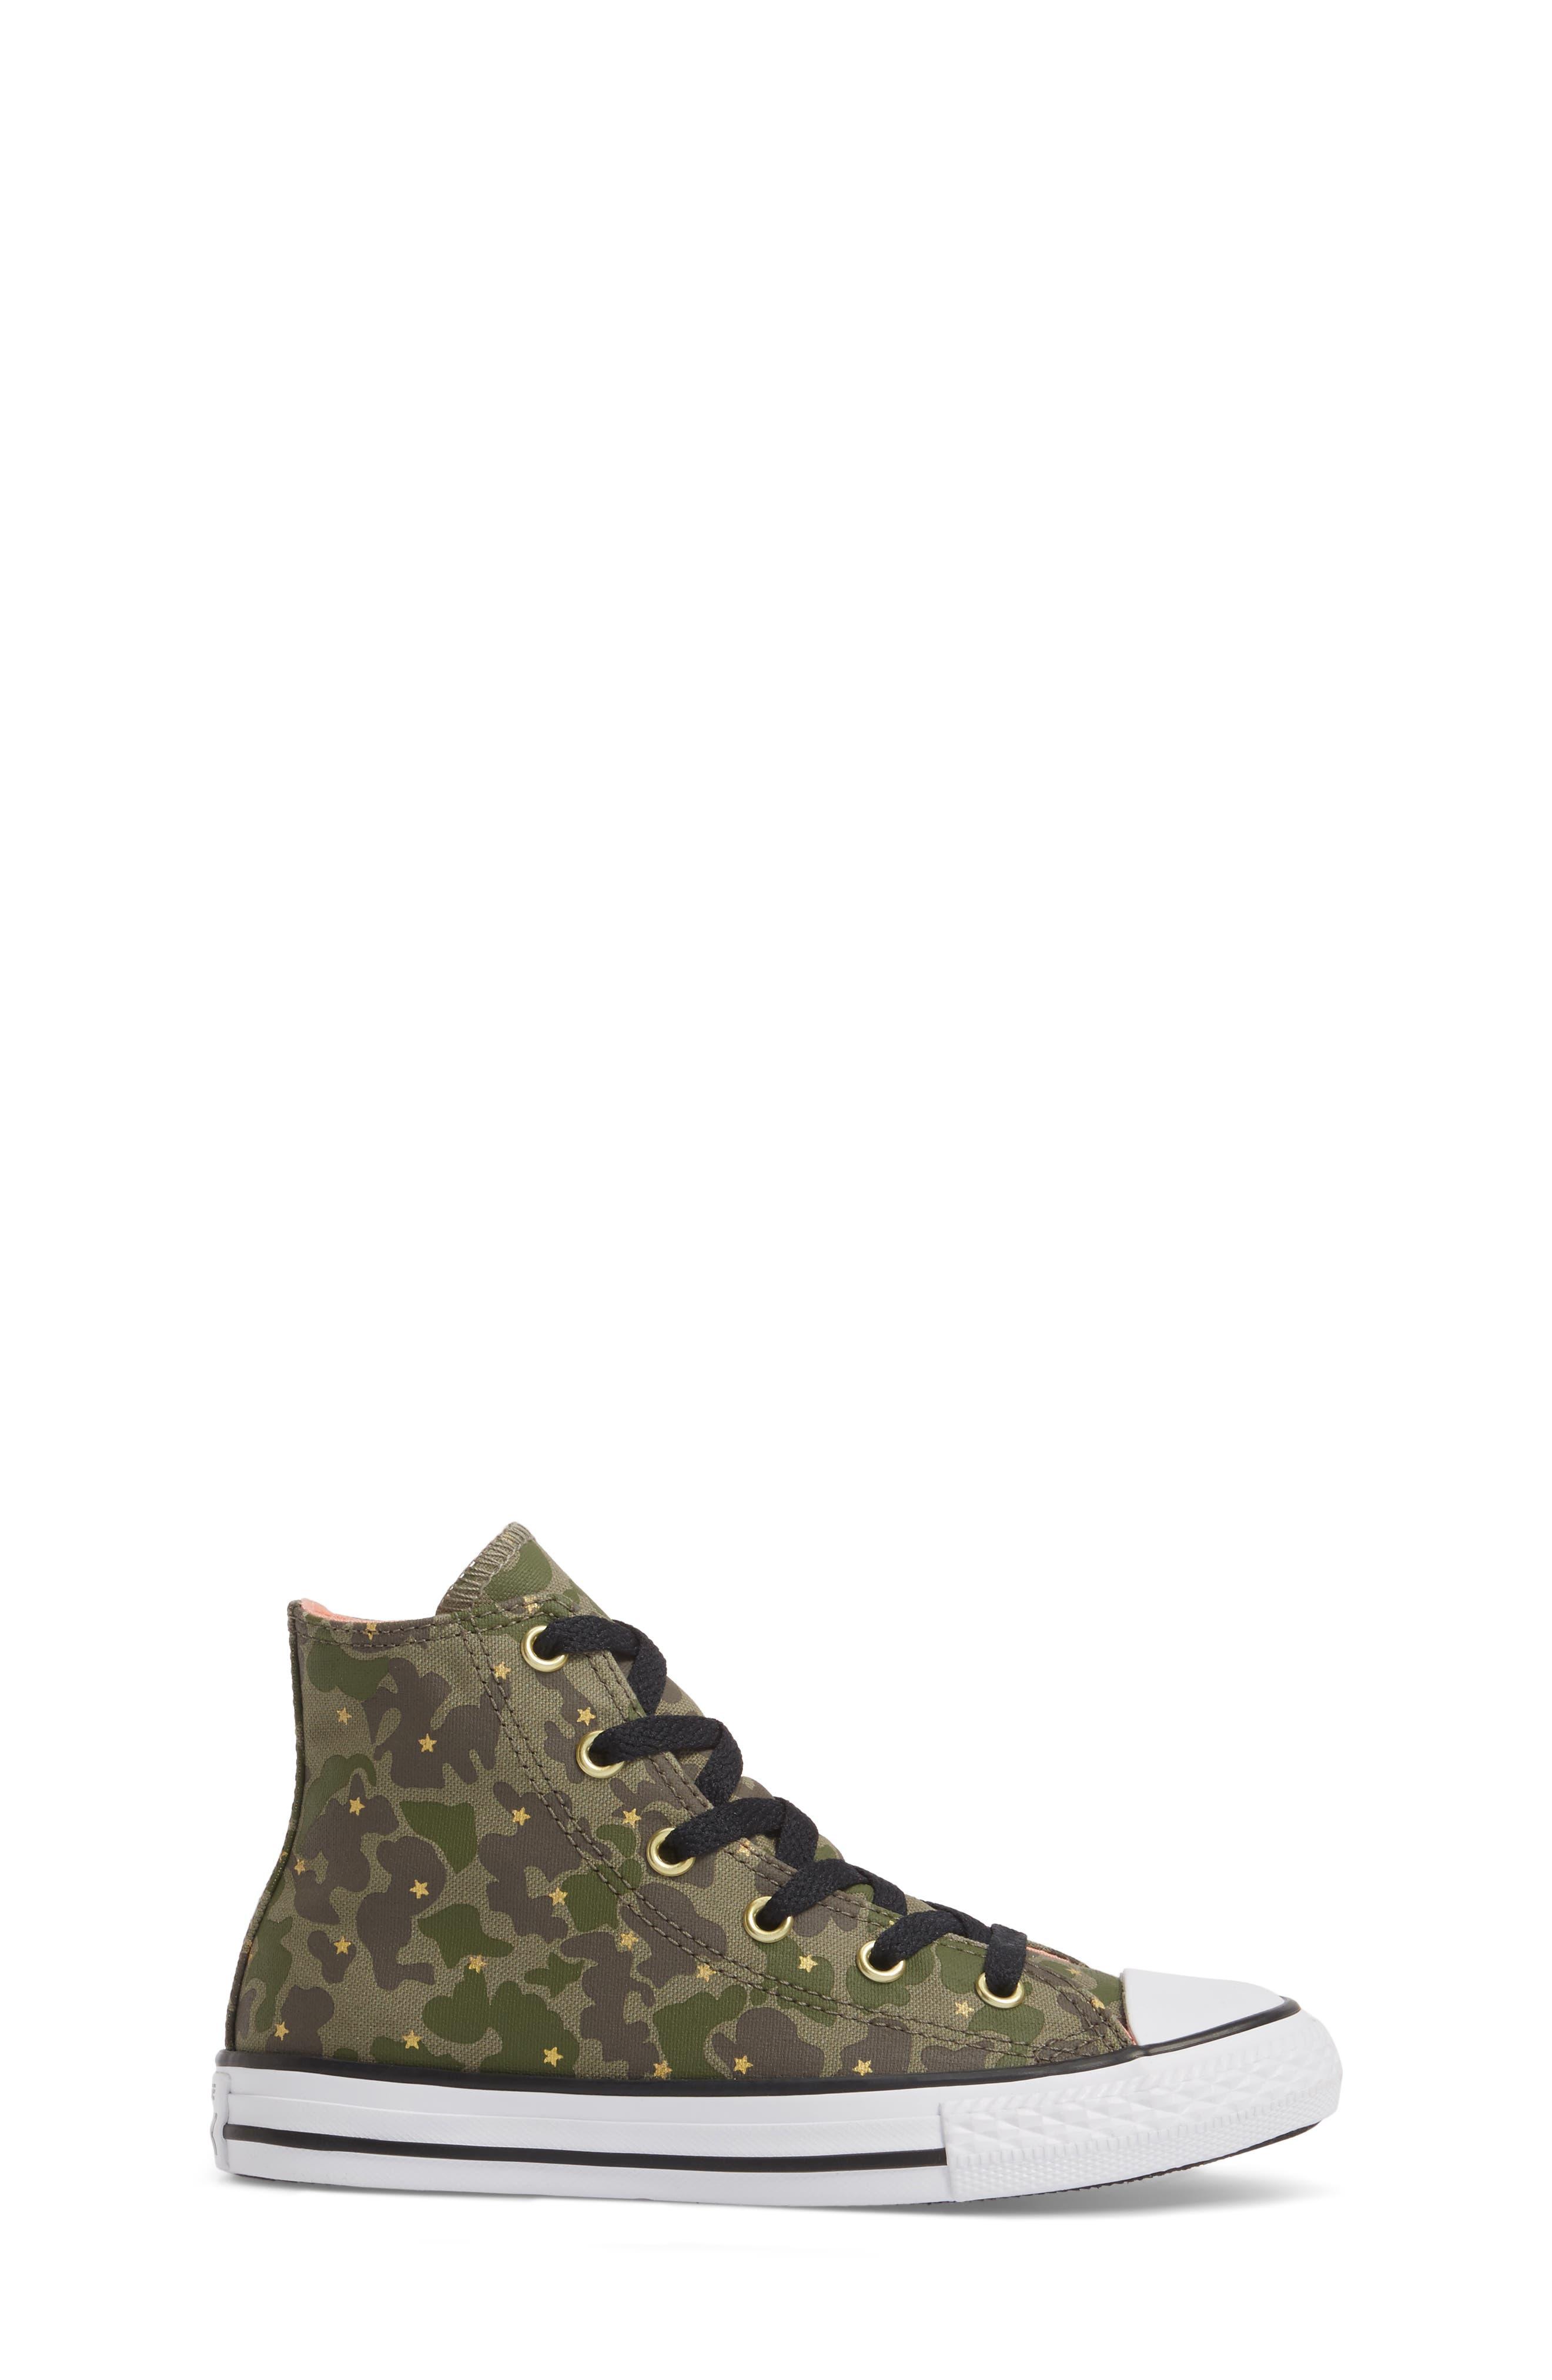 Camo High Top Sneaker,                             Alternate thumbnail 3, color,                             Surplus